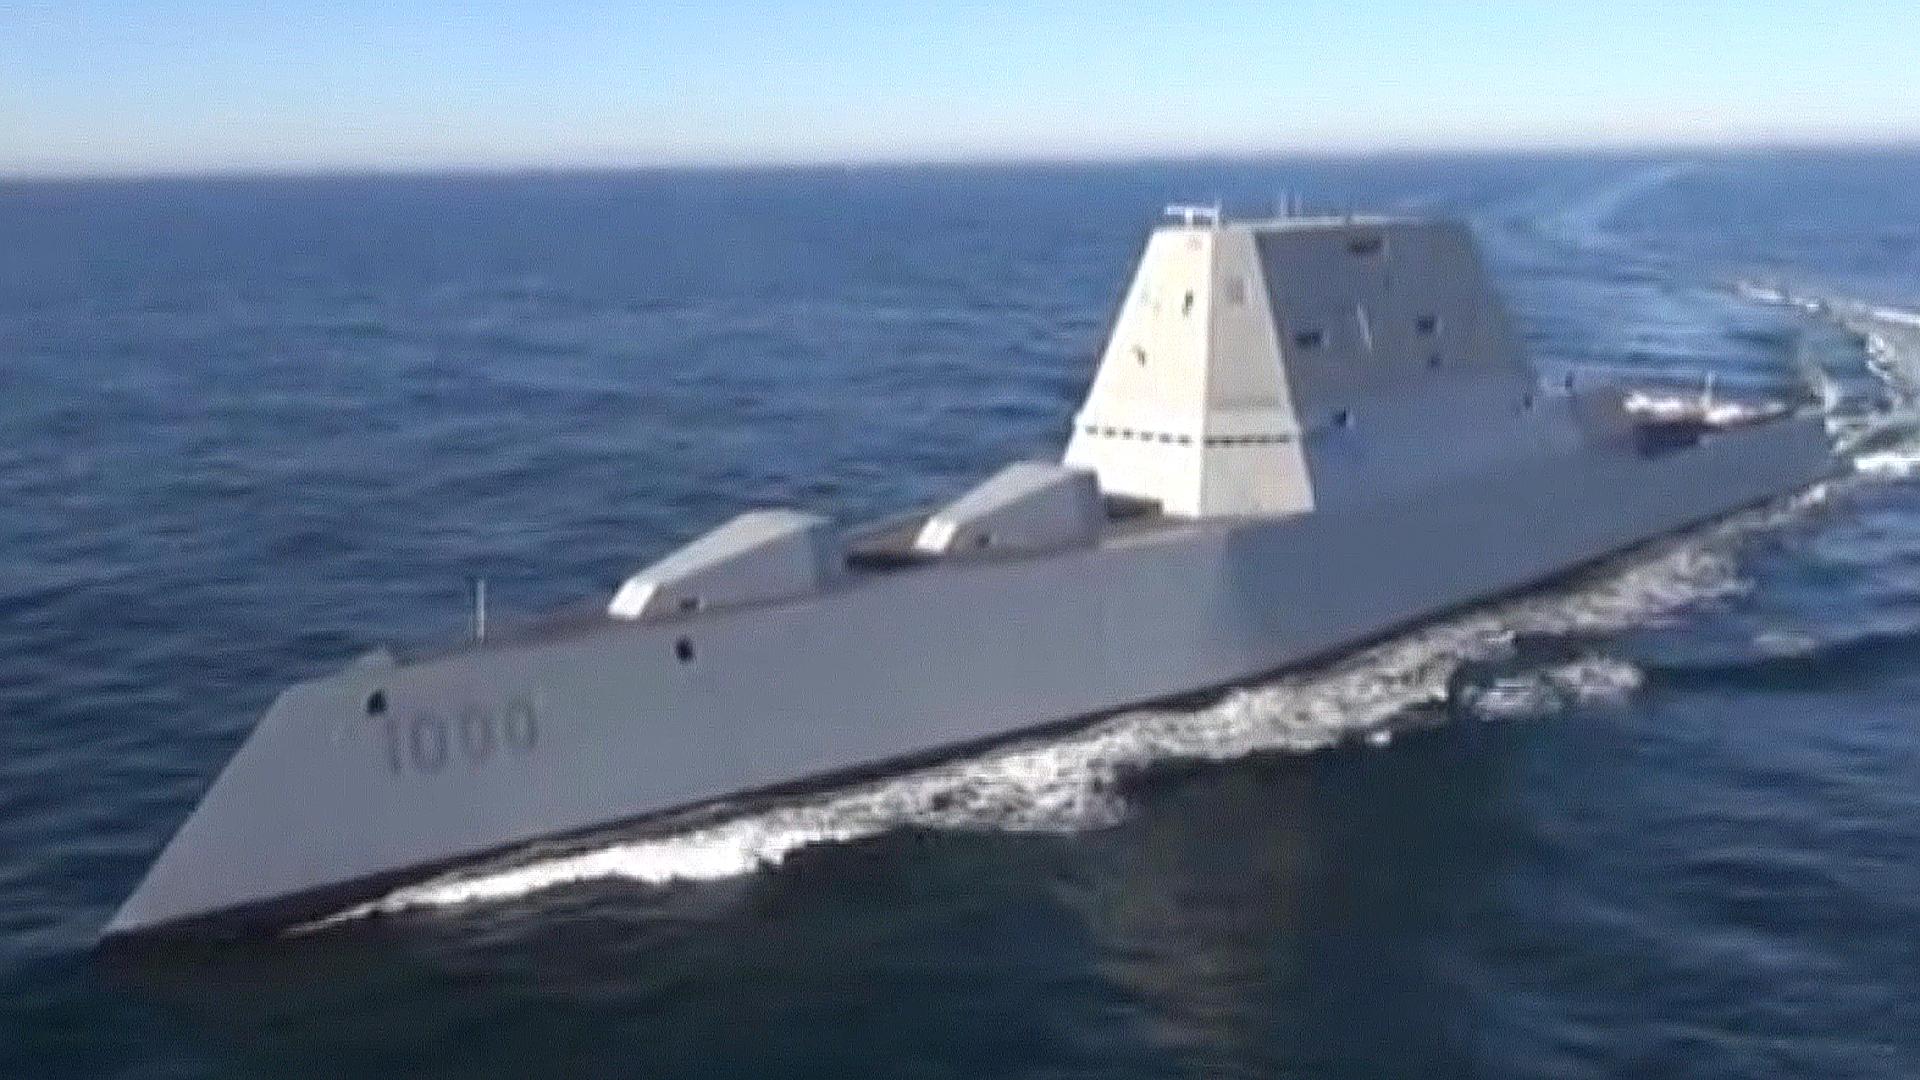 & Watch the USS Zumwalt Conduct Sea Trials - NBC News